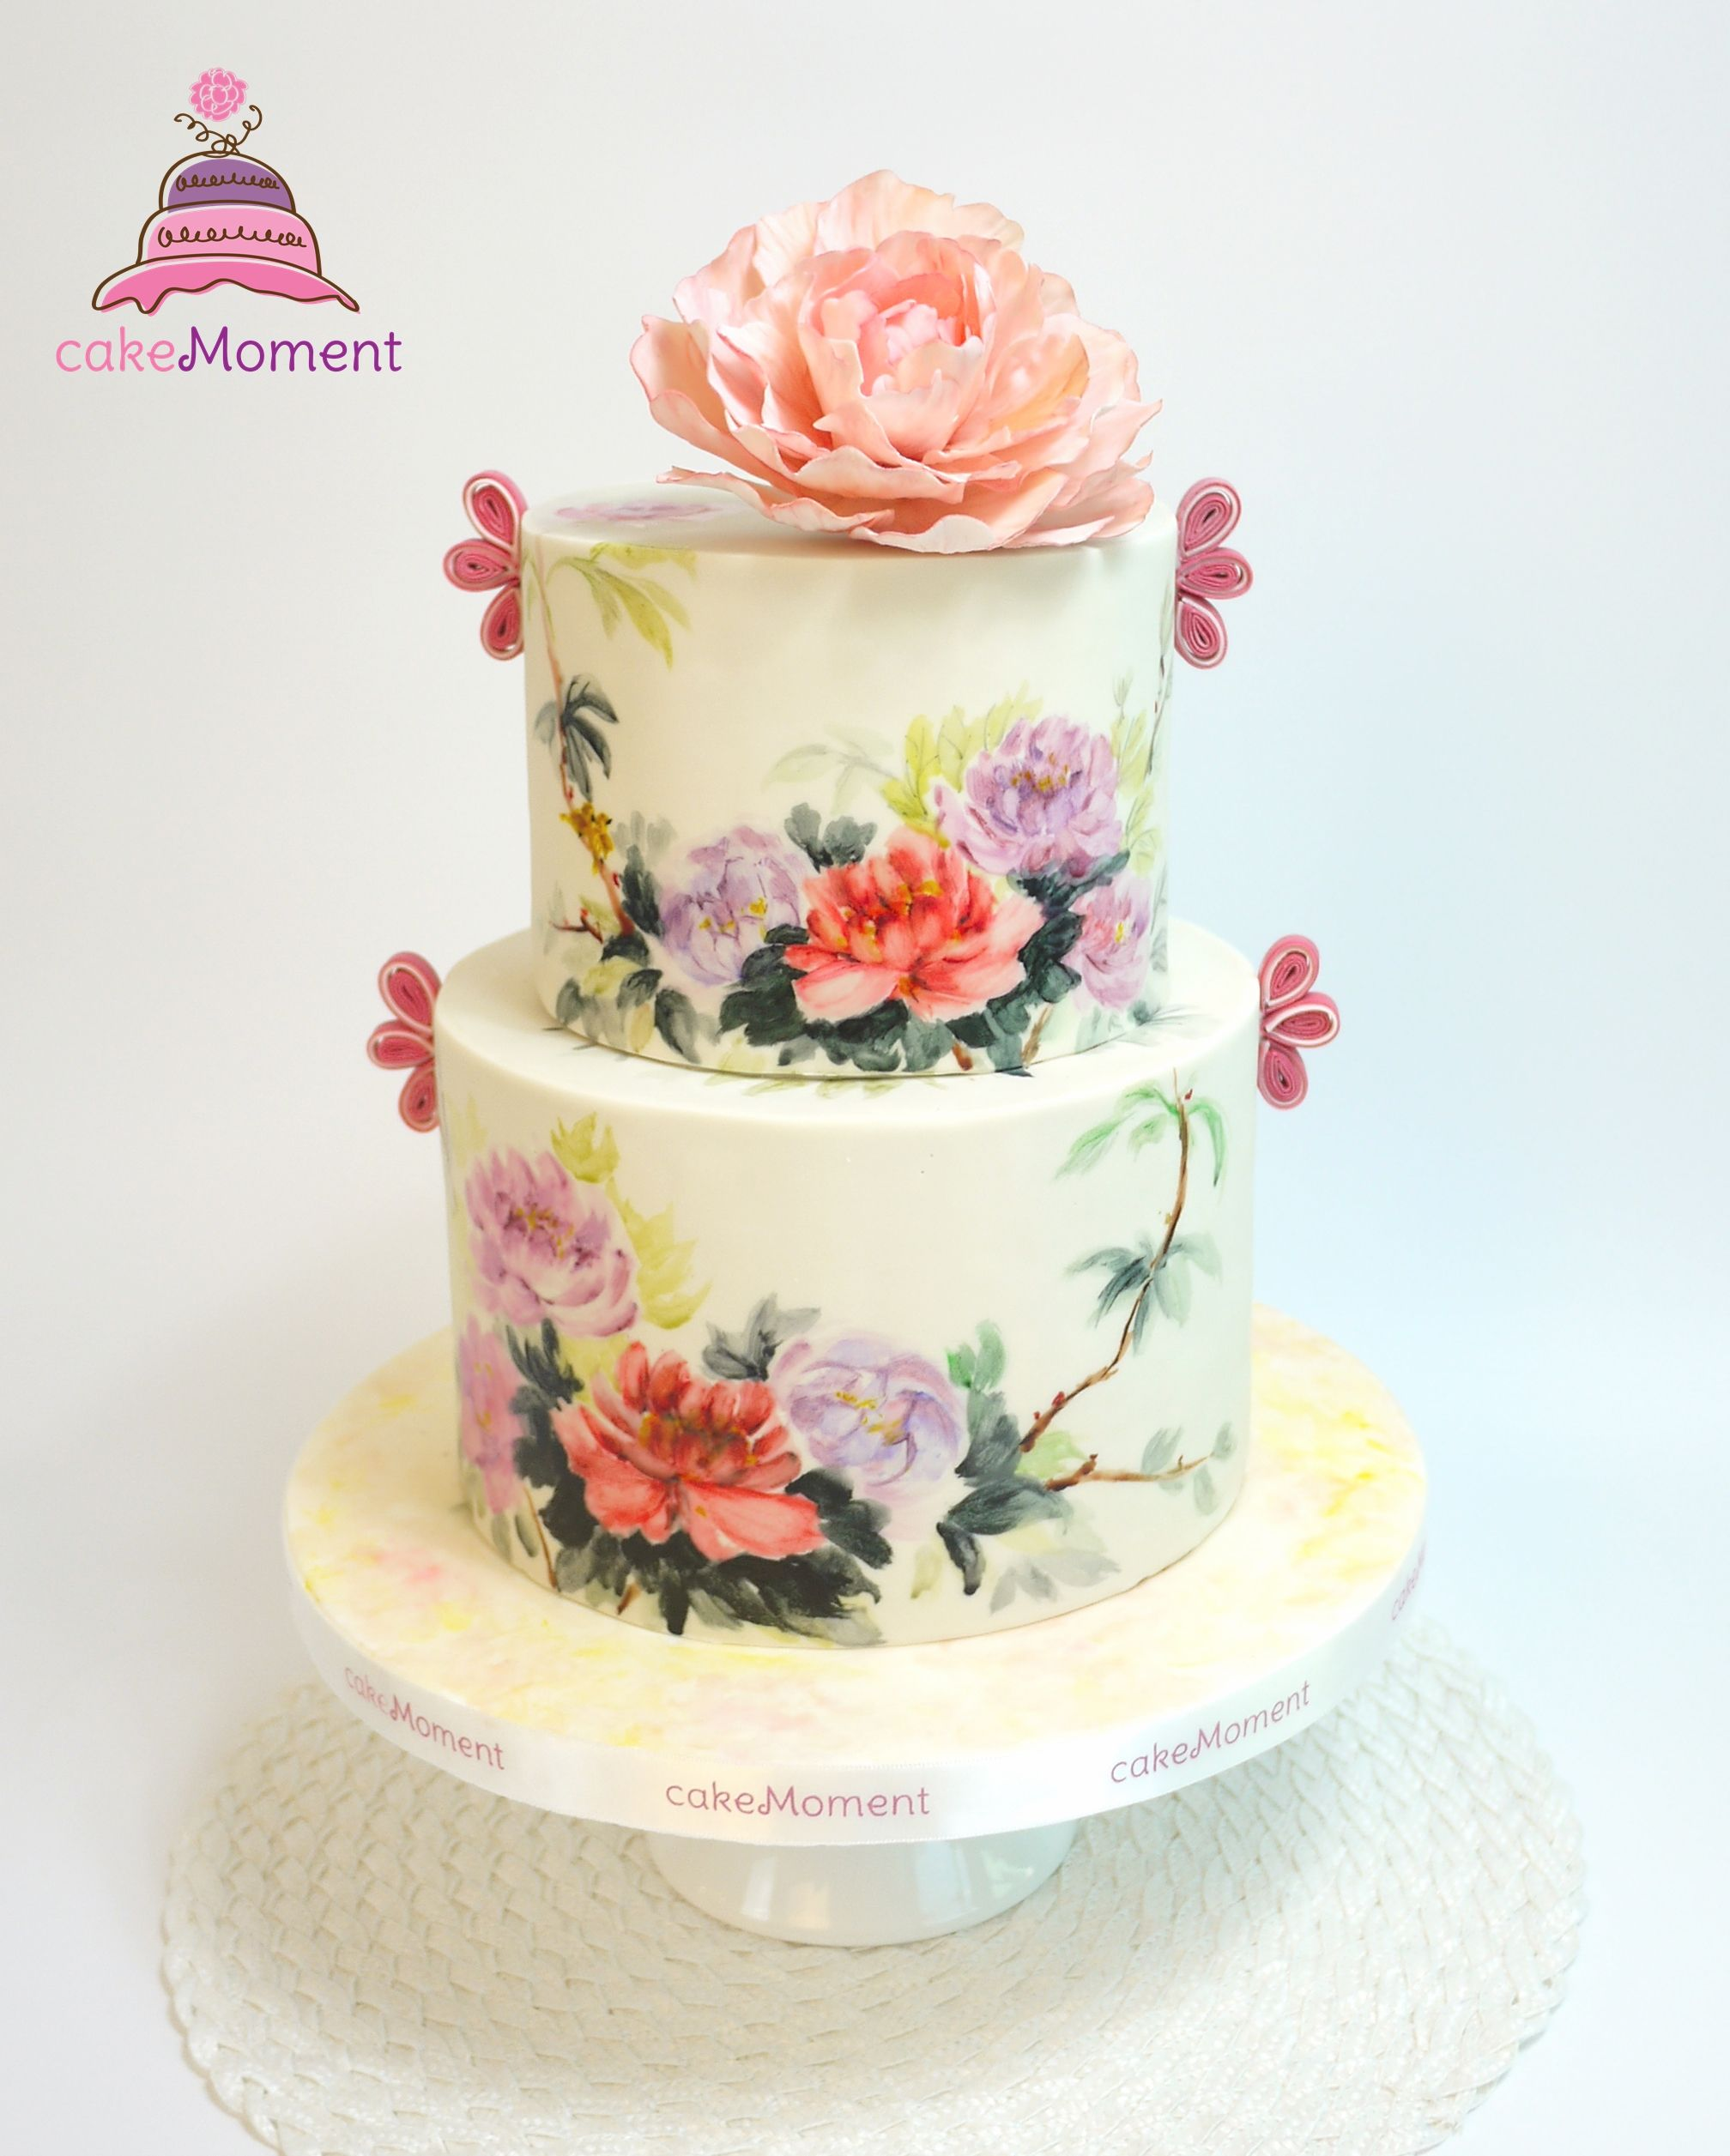 Cakemoment Cakemomenthk Cakemoment Wedding Hk Wedding Cake Hk Sugar Flowers Elegant Contemporary C Hand Painted Cakes Painted Cakes Wedding Cakes